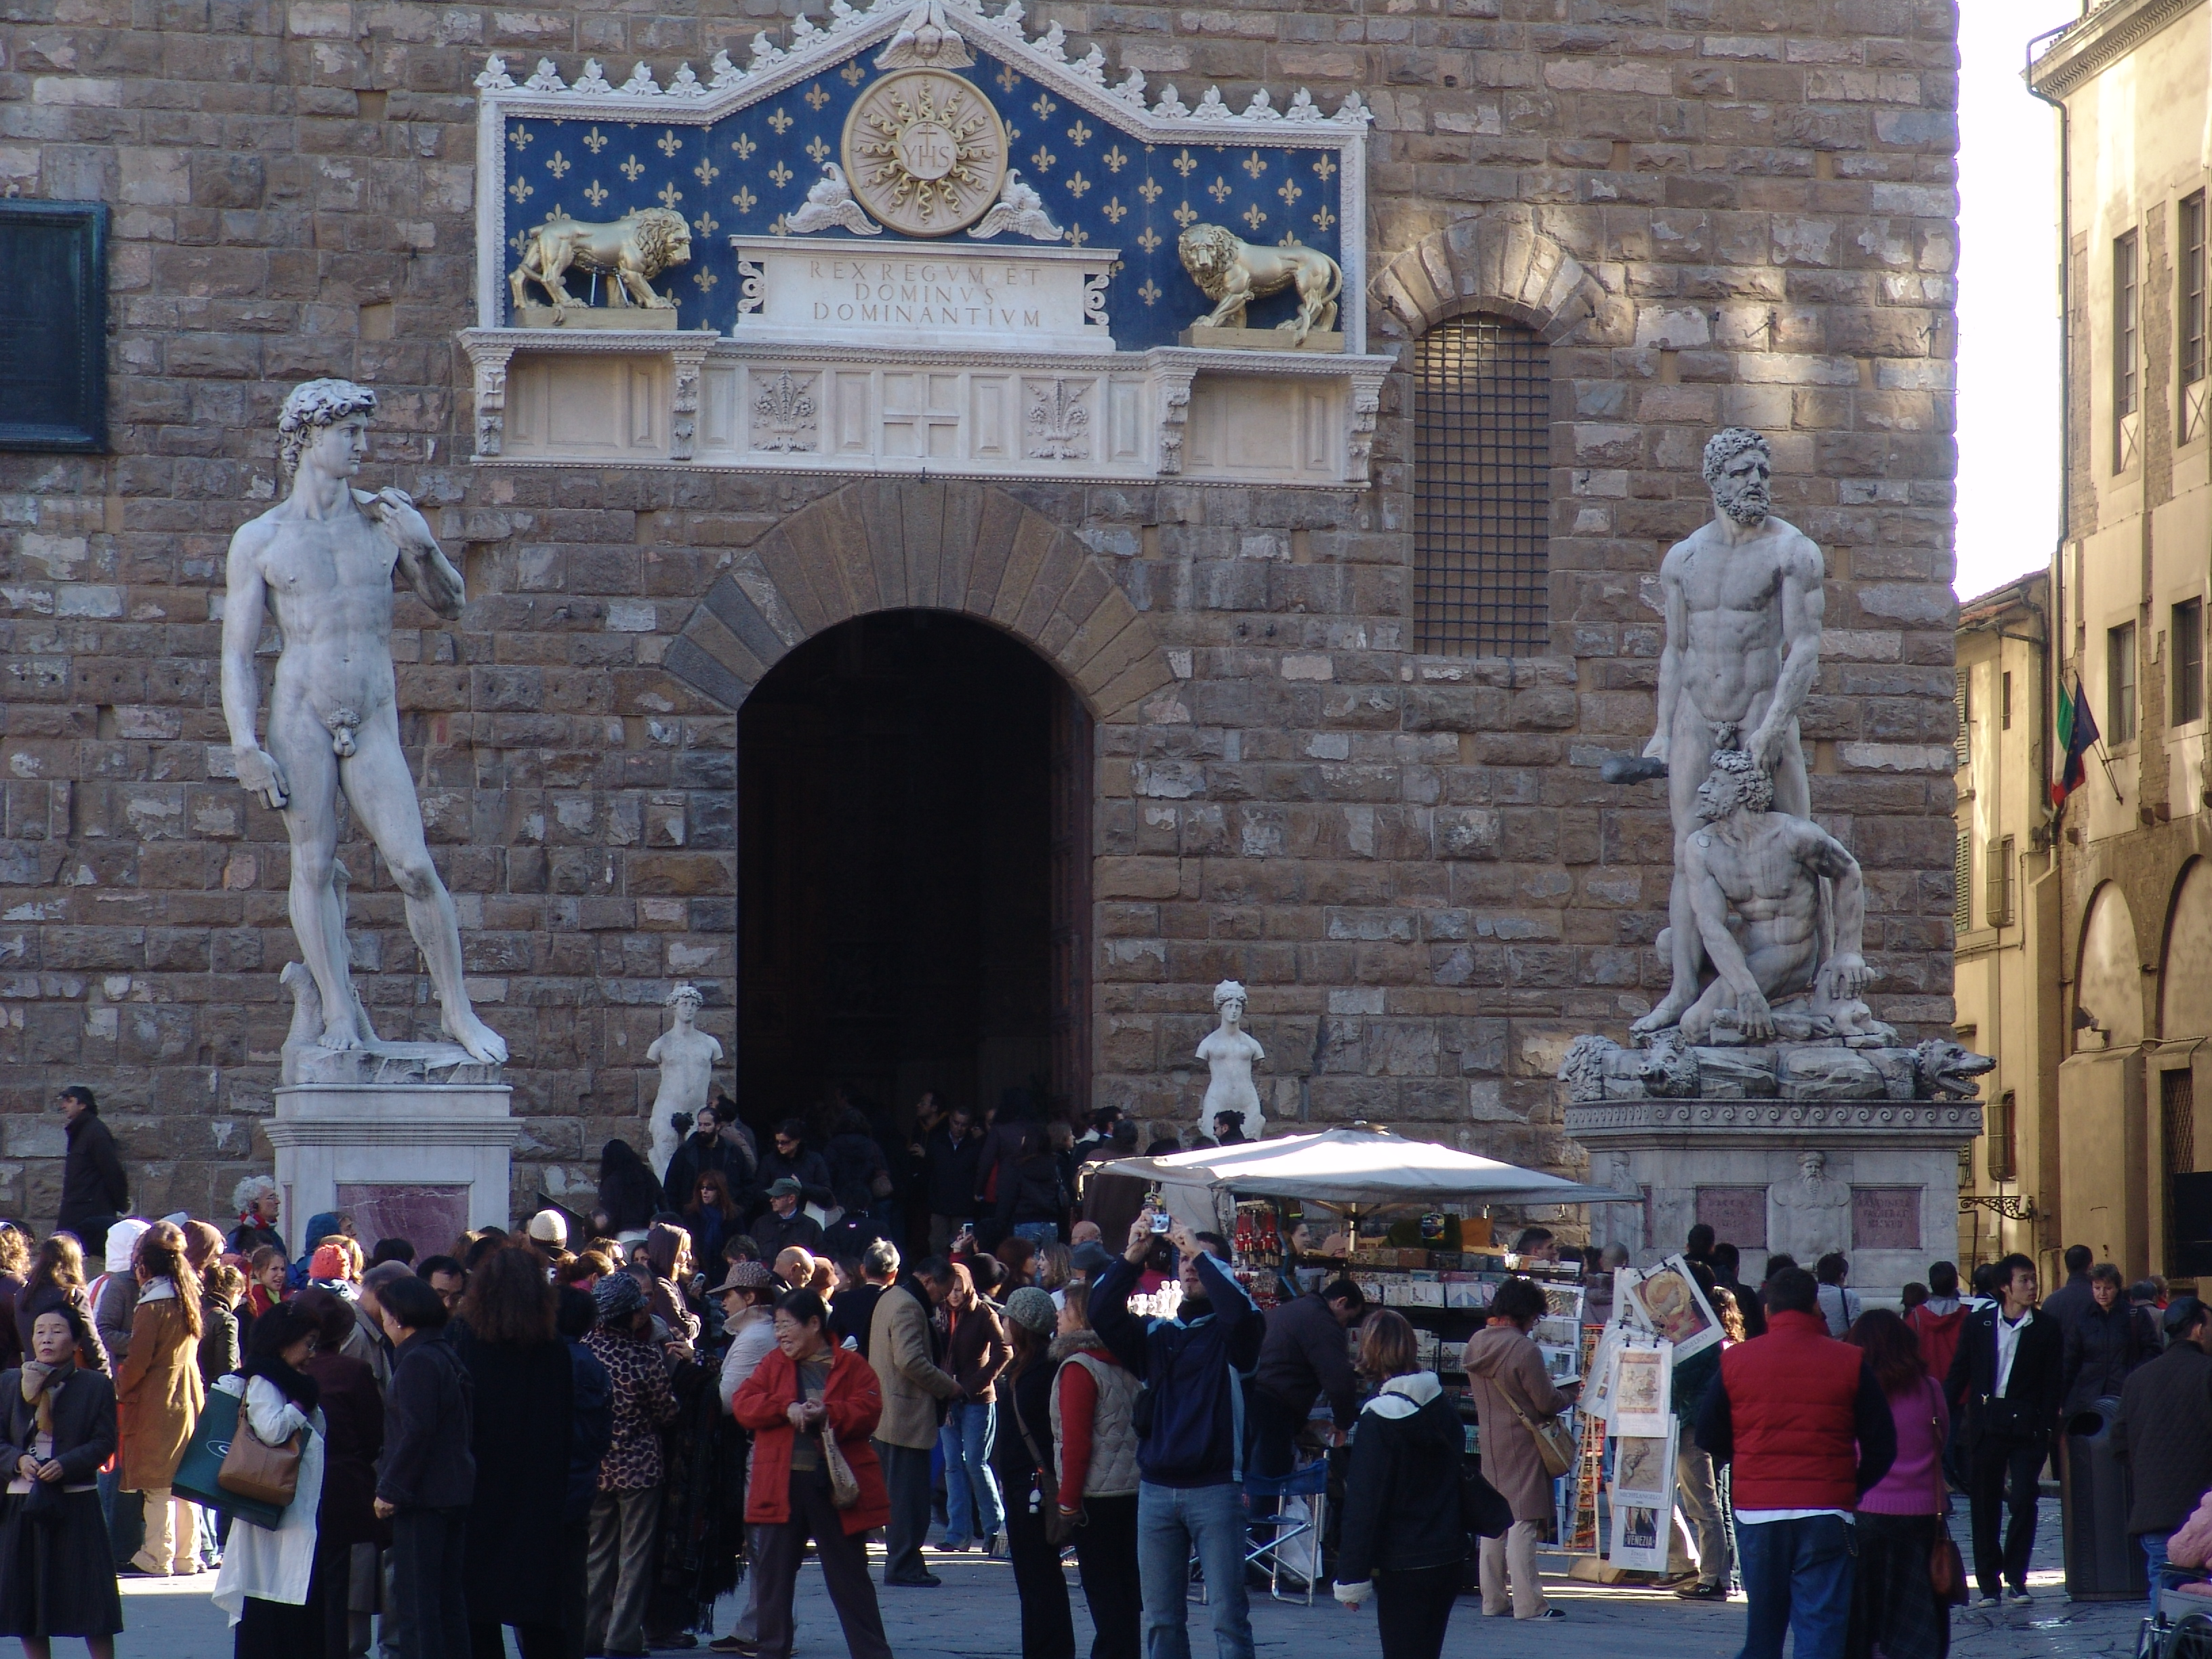 palazzo vecchio entrance - photo #16